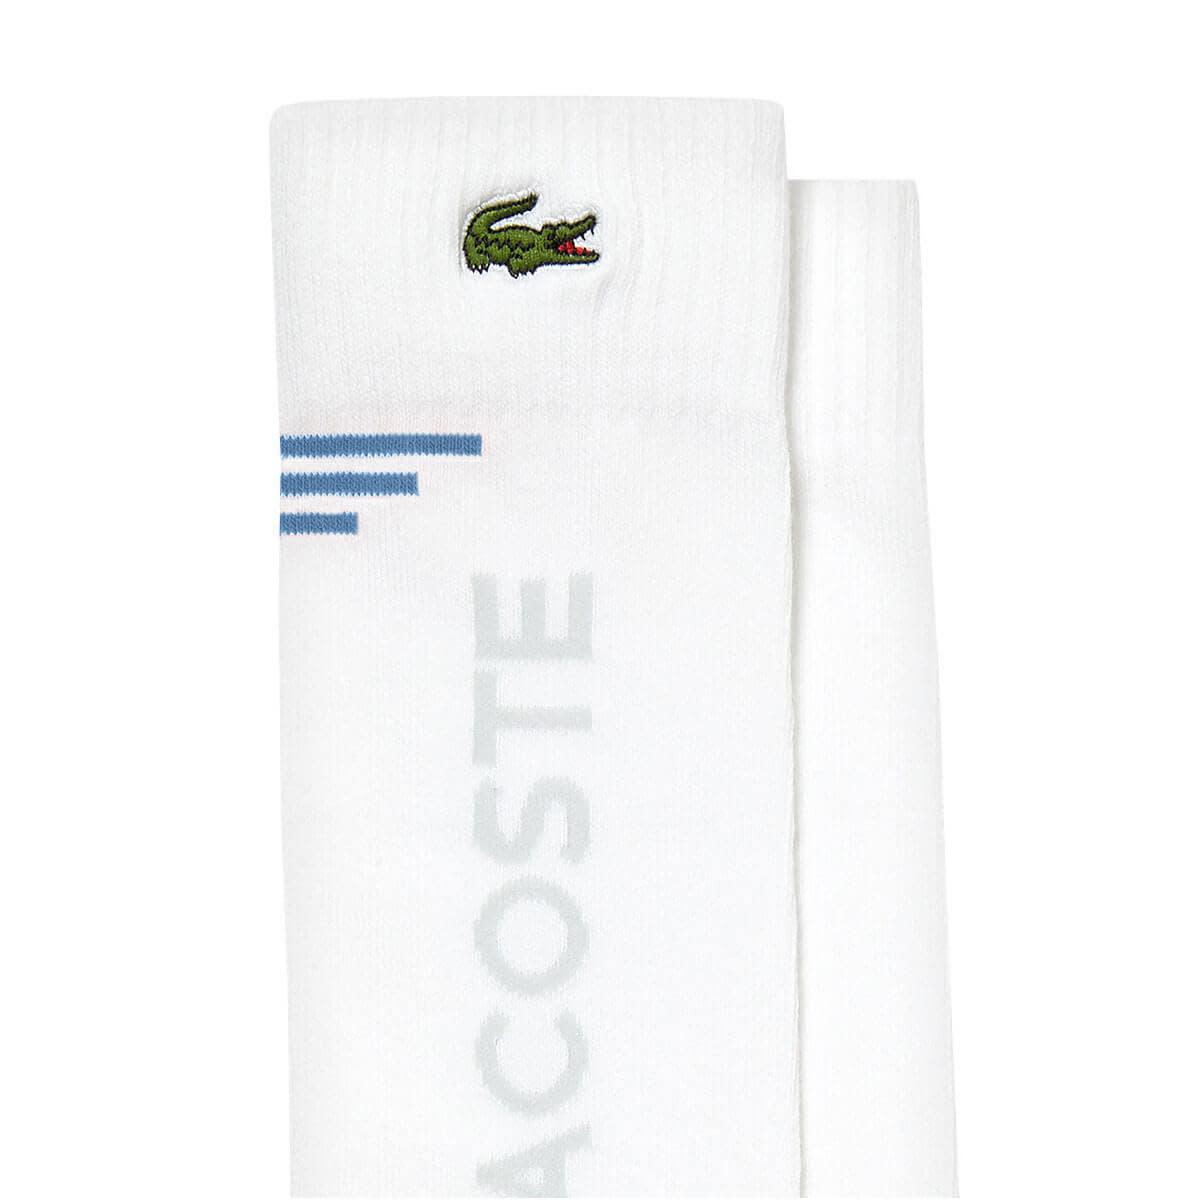 Lacoste Lacoste Socks White/Blue (8.5-12 US)